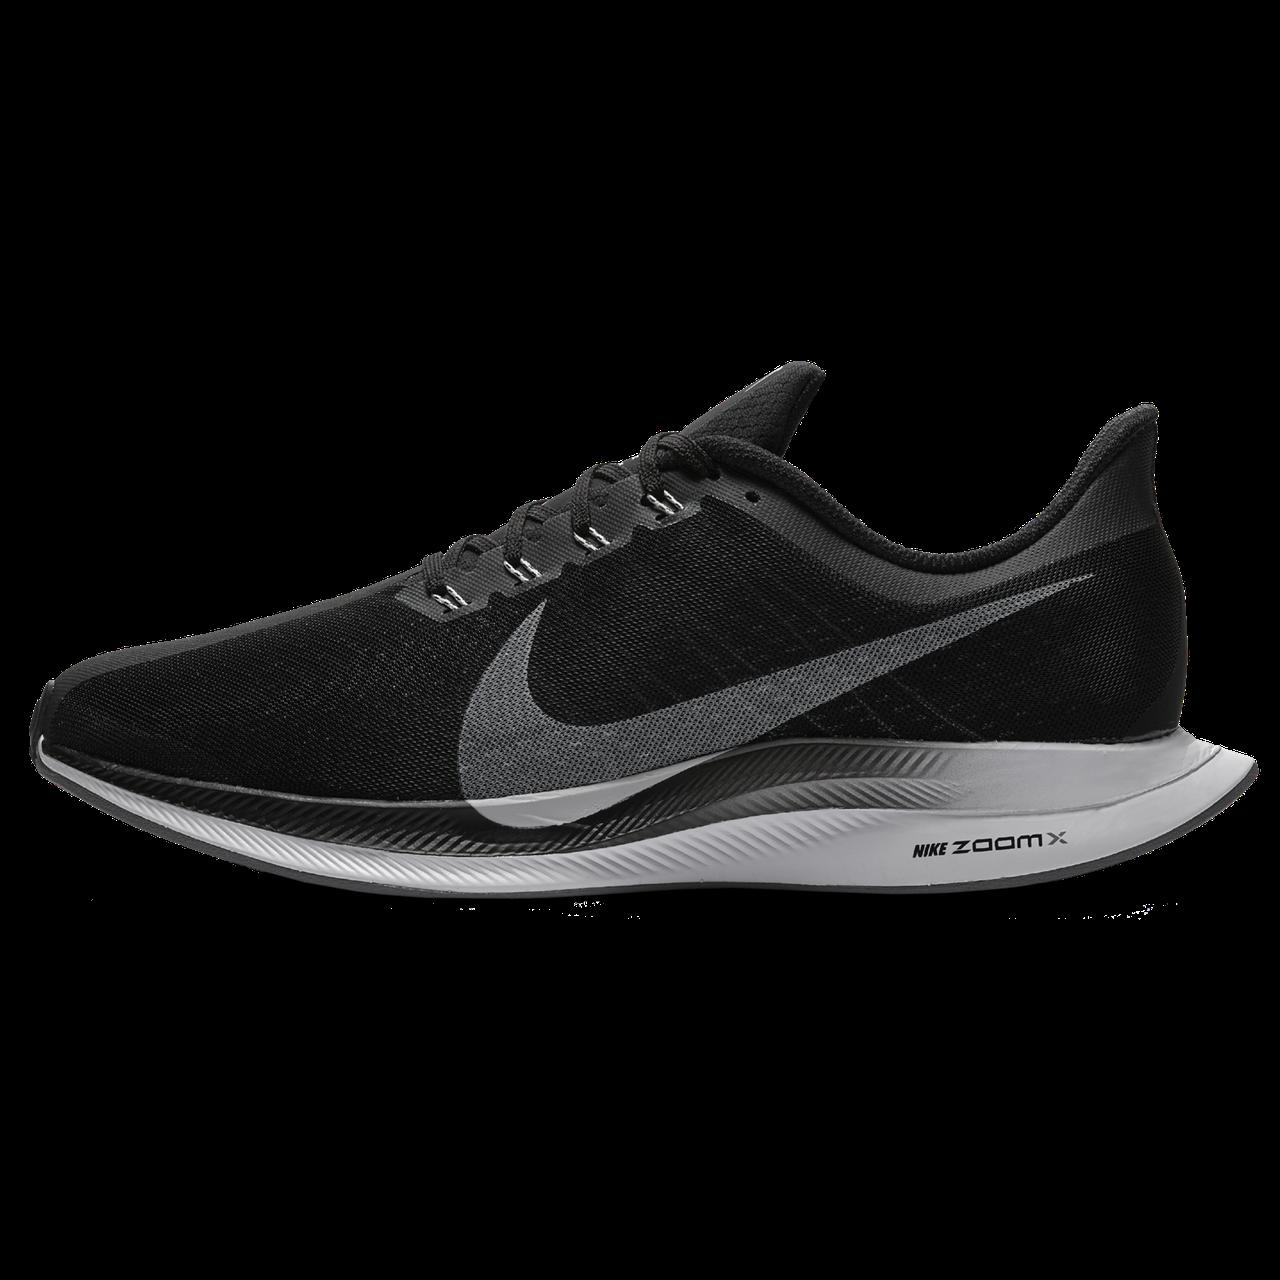 7aed2e61 Оригинальные Кроссовки Nike Zoom Pegasus 35 Turbo — в Категории ...